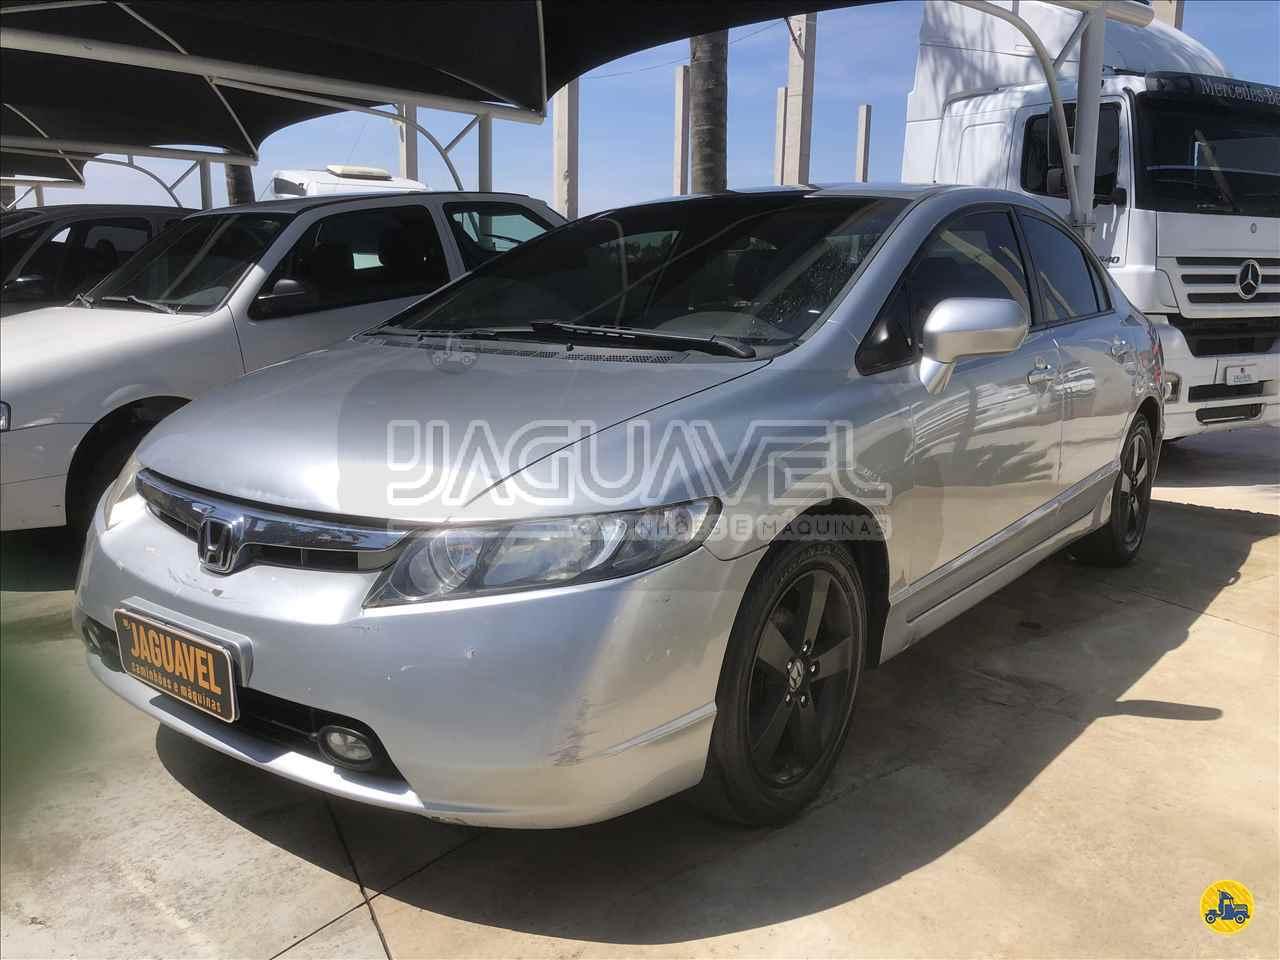 CARRO HONDA Civic Sedan 1.8 LXS Jaguavel Caminhões JAGUARIAIVA PARANÁ PR